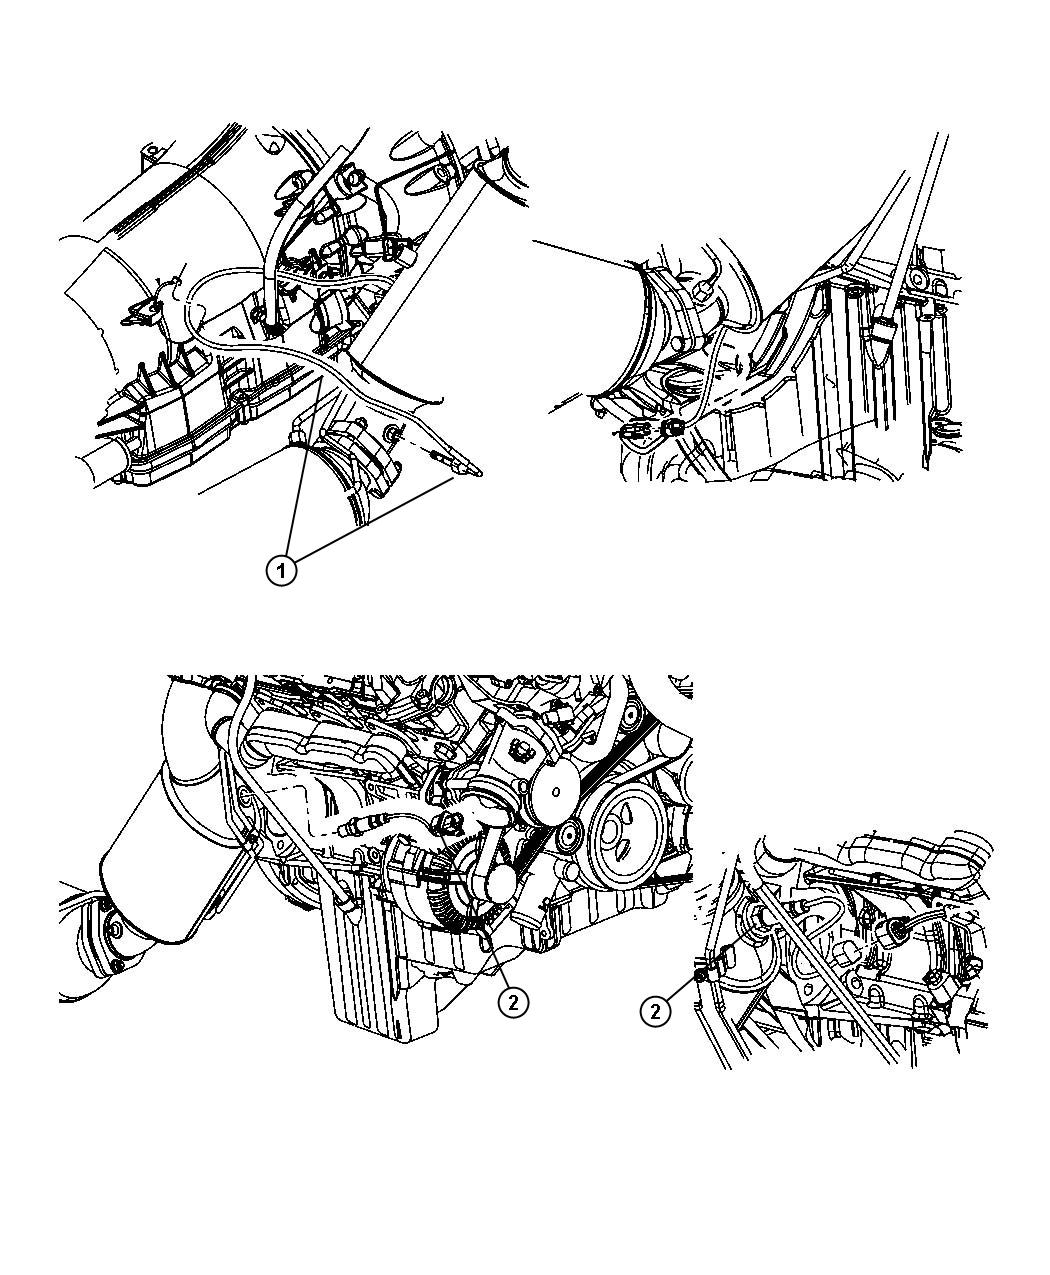 2008 Jeep Grand Cherokee Sensor. Exhaust temperature